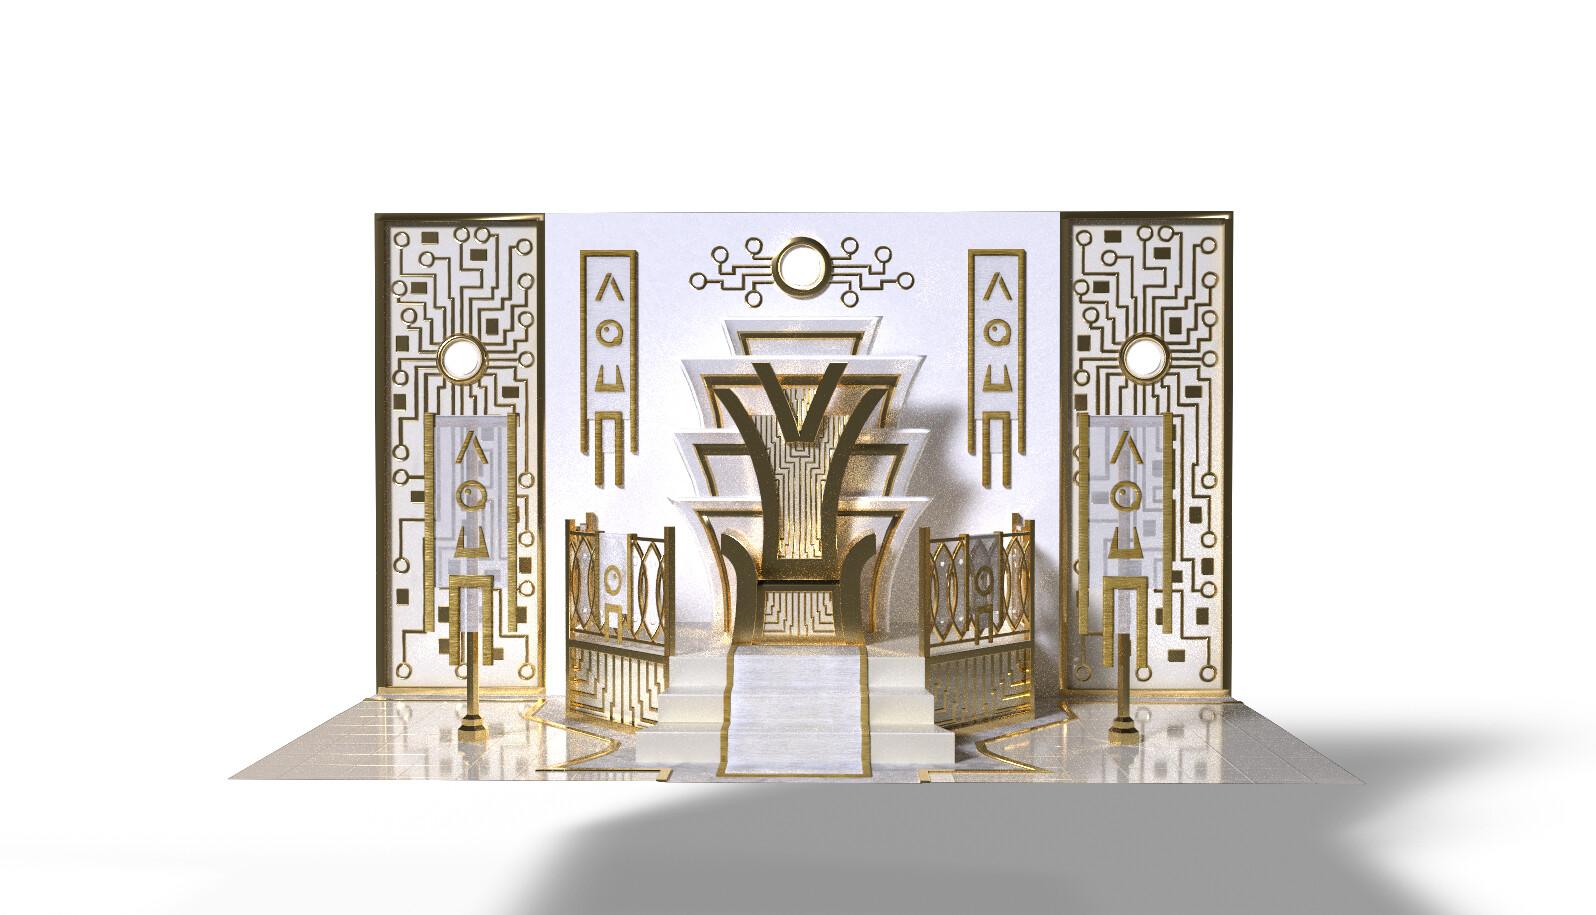 Futuristic throne room. IRay render.